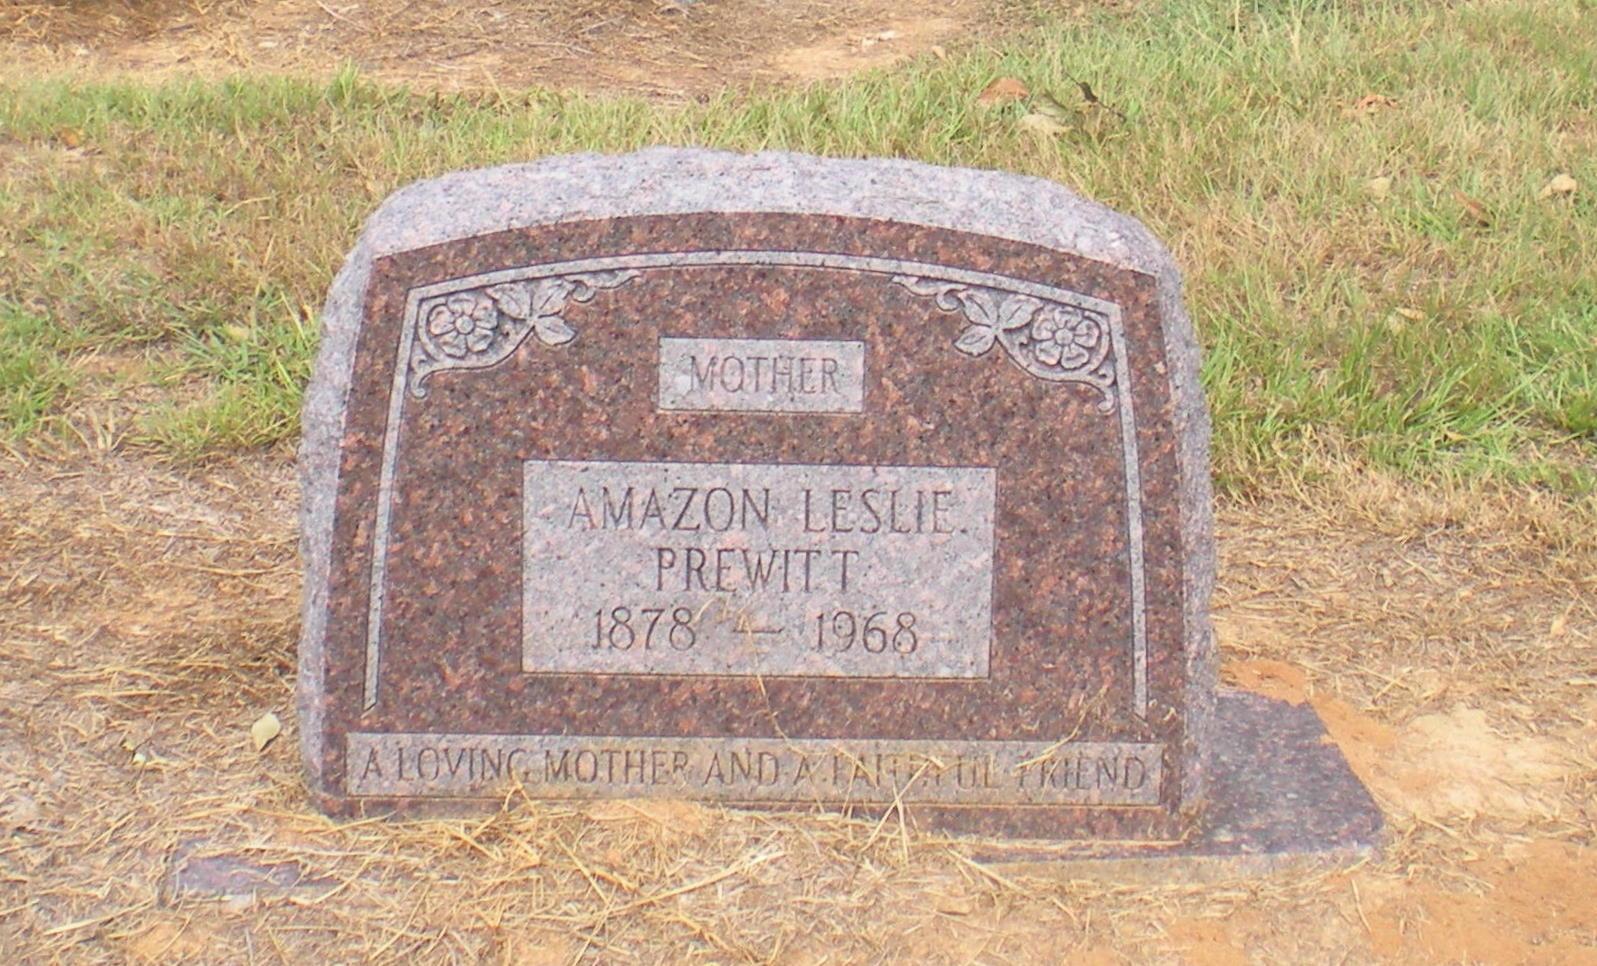 Amazon Leslie Prewitt